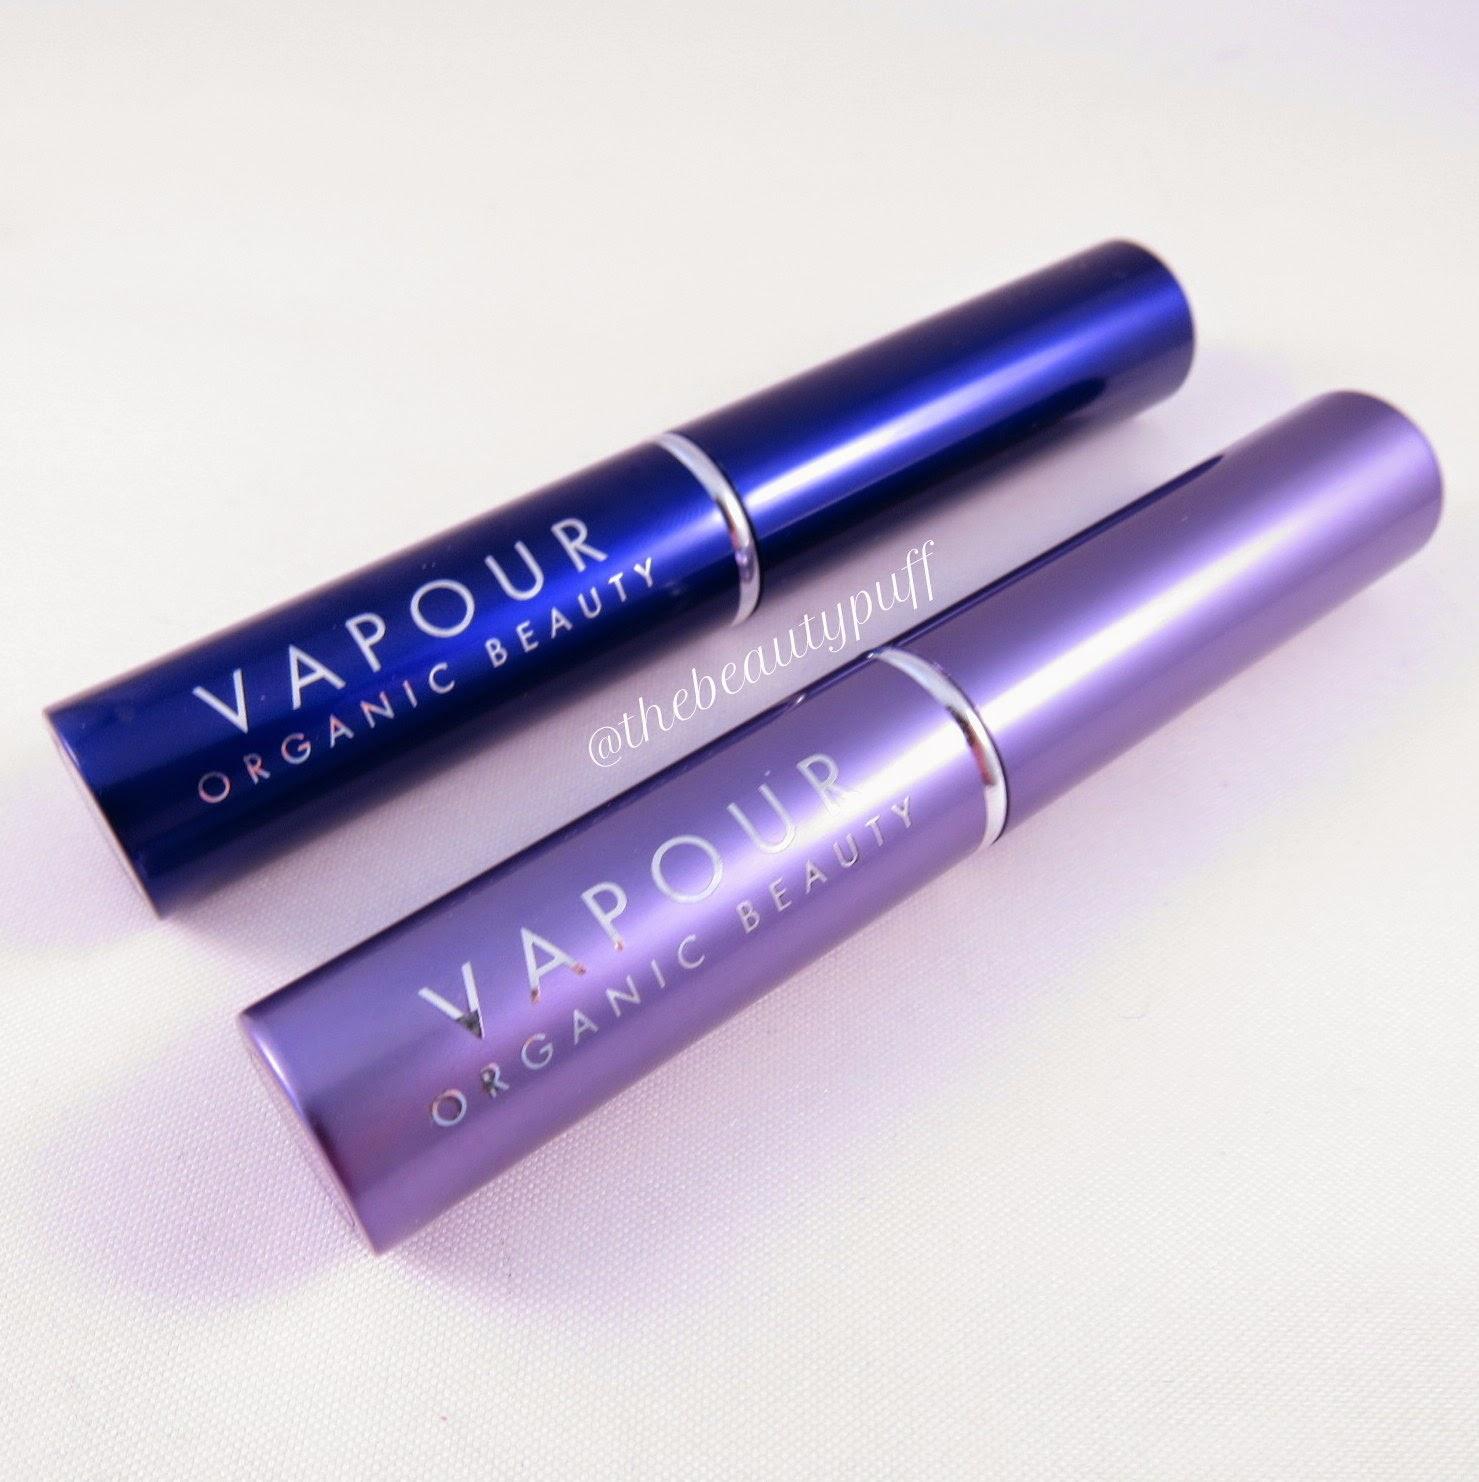 vapour beauty - the beauty puff